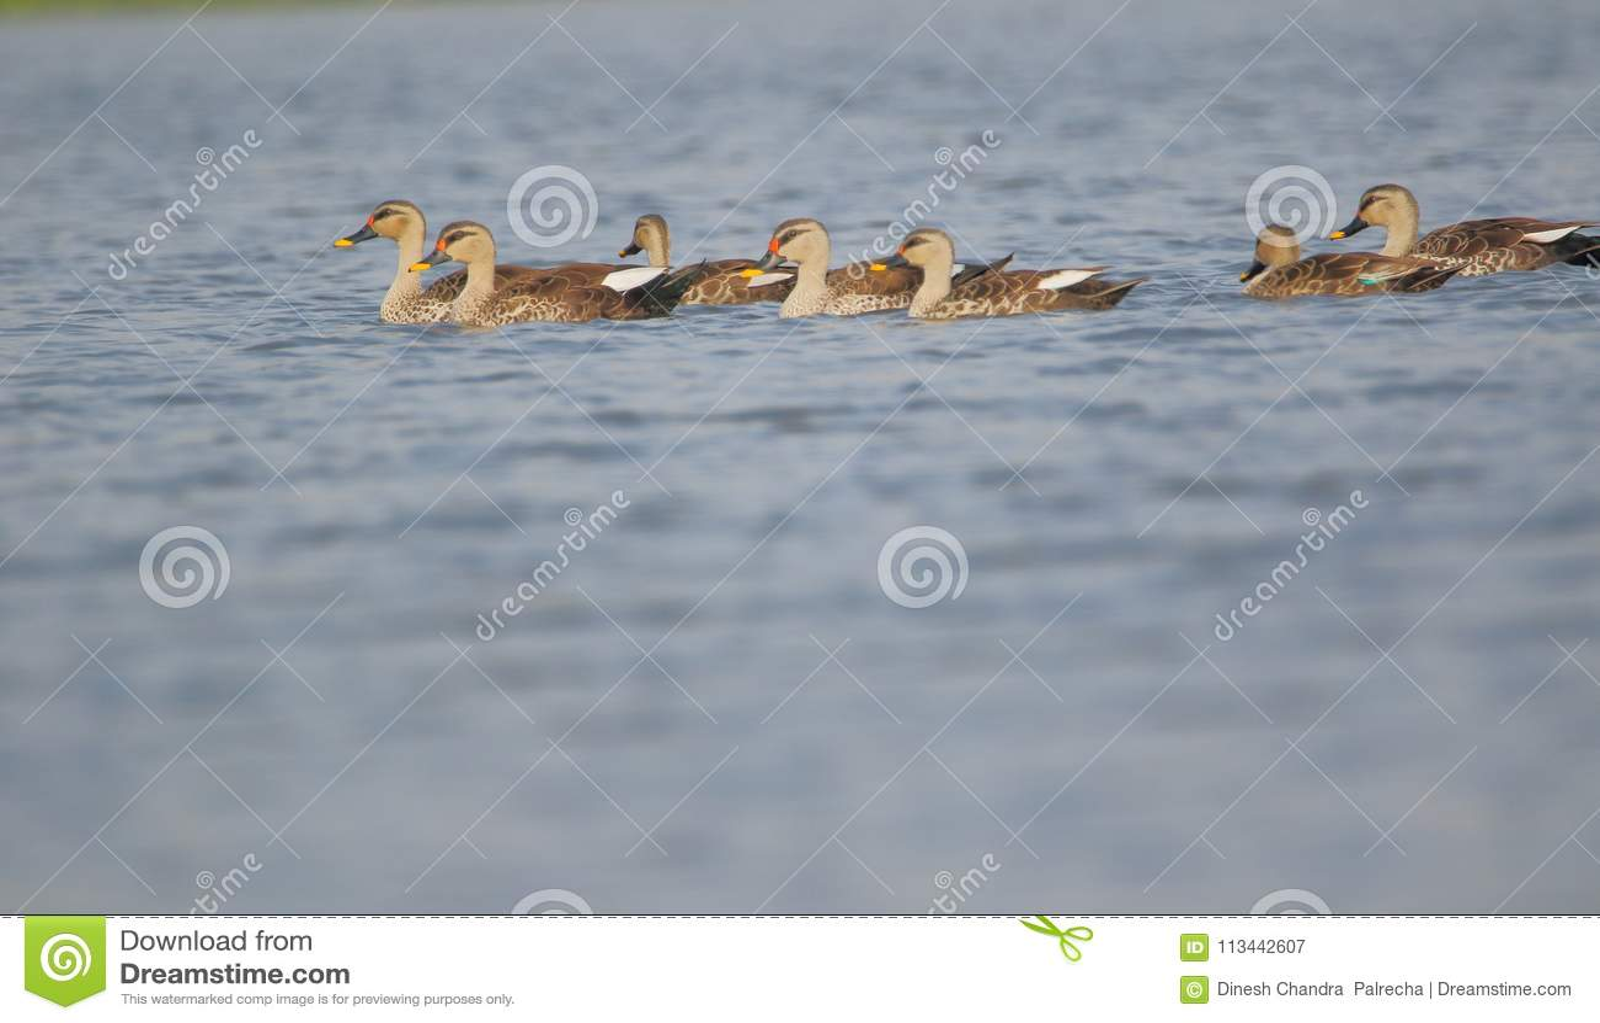 Spot billed duck family